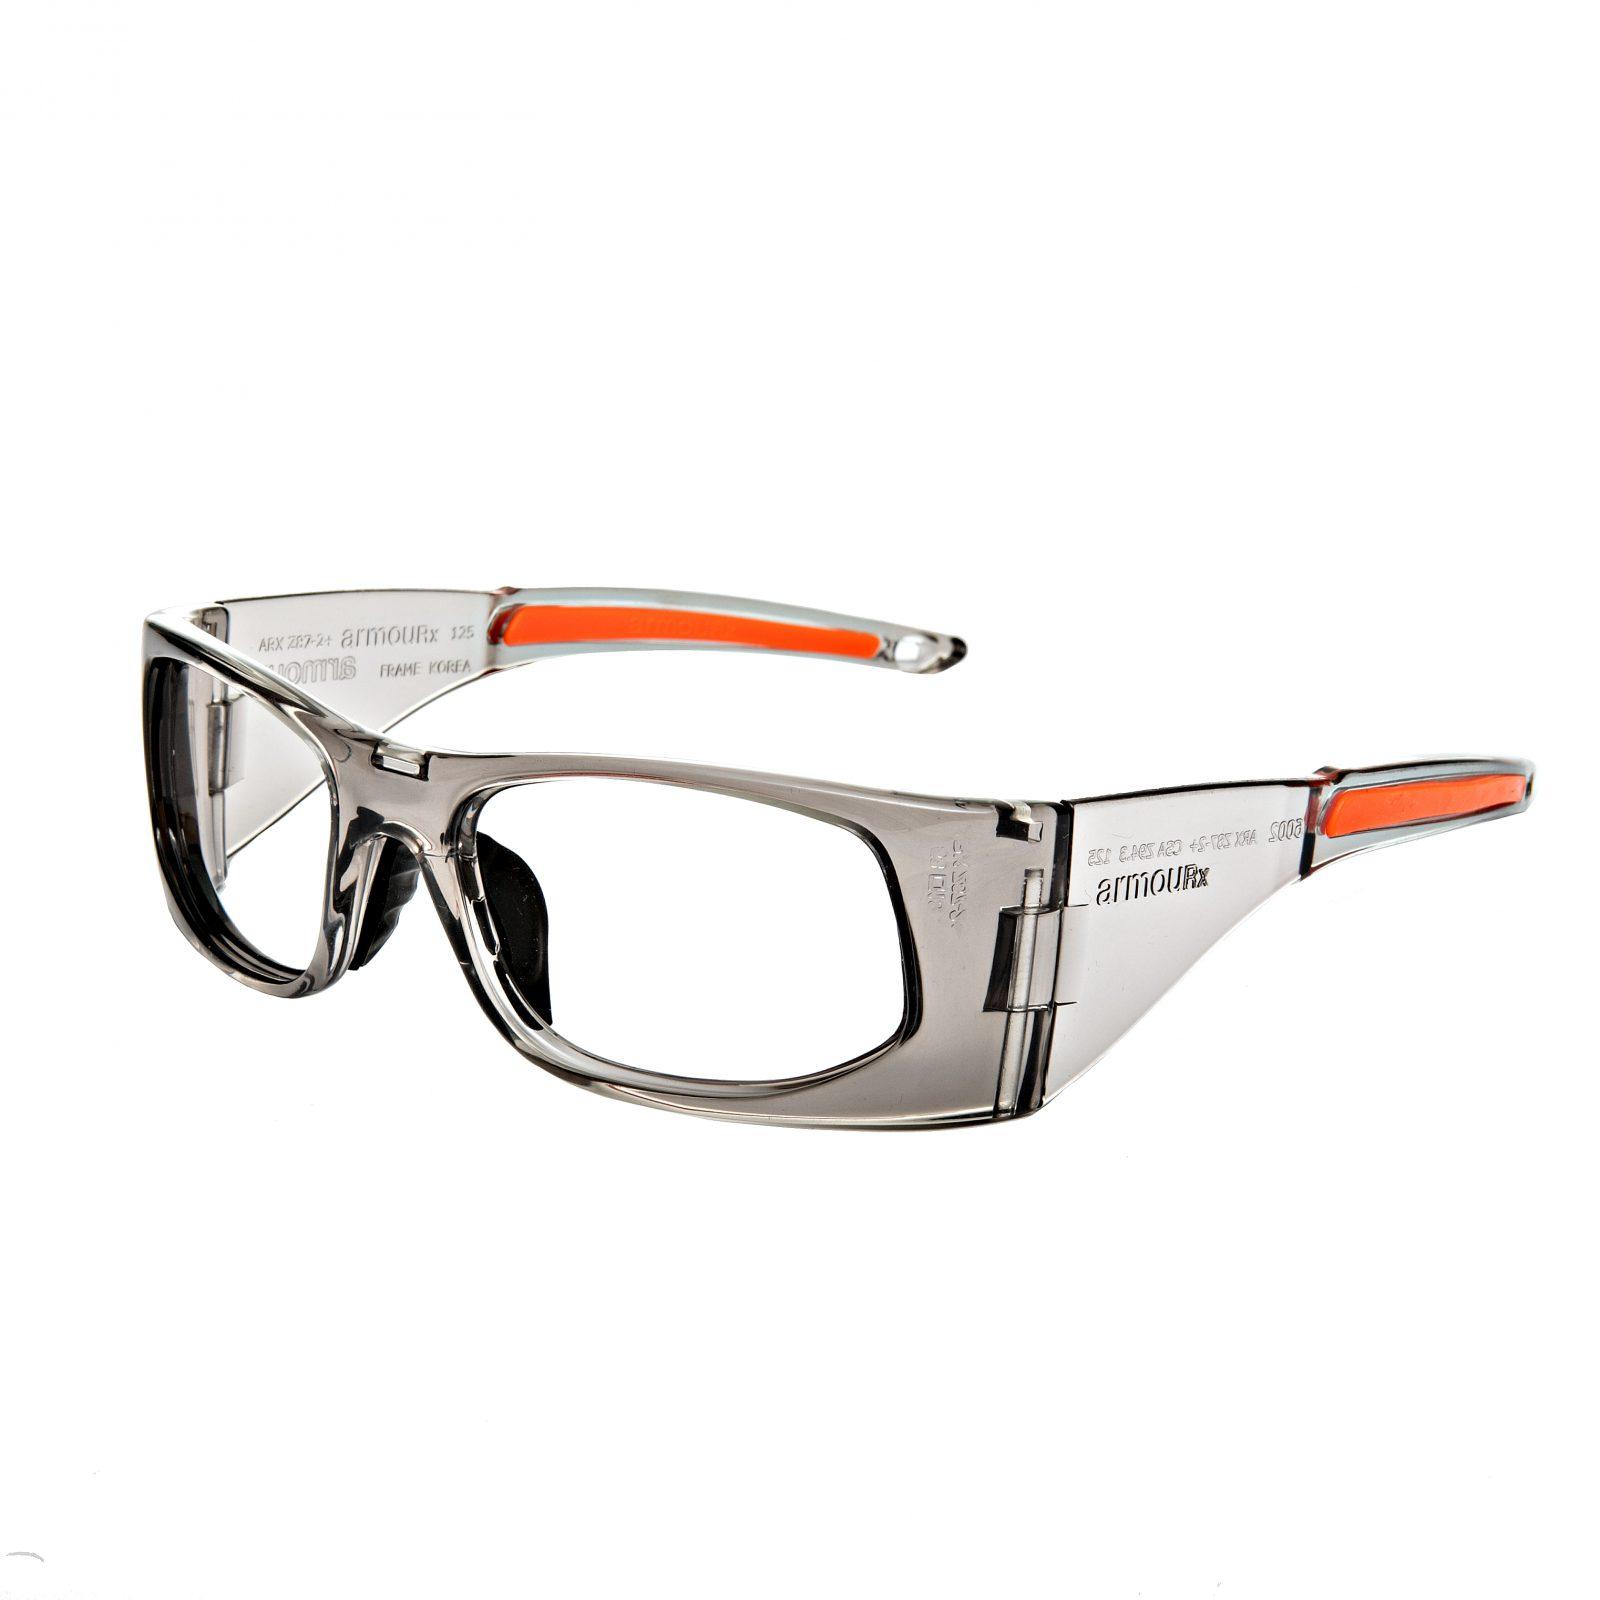 6002-gris-45-Securovision